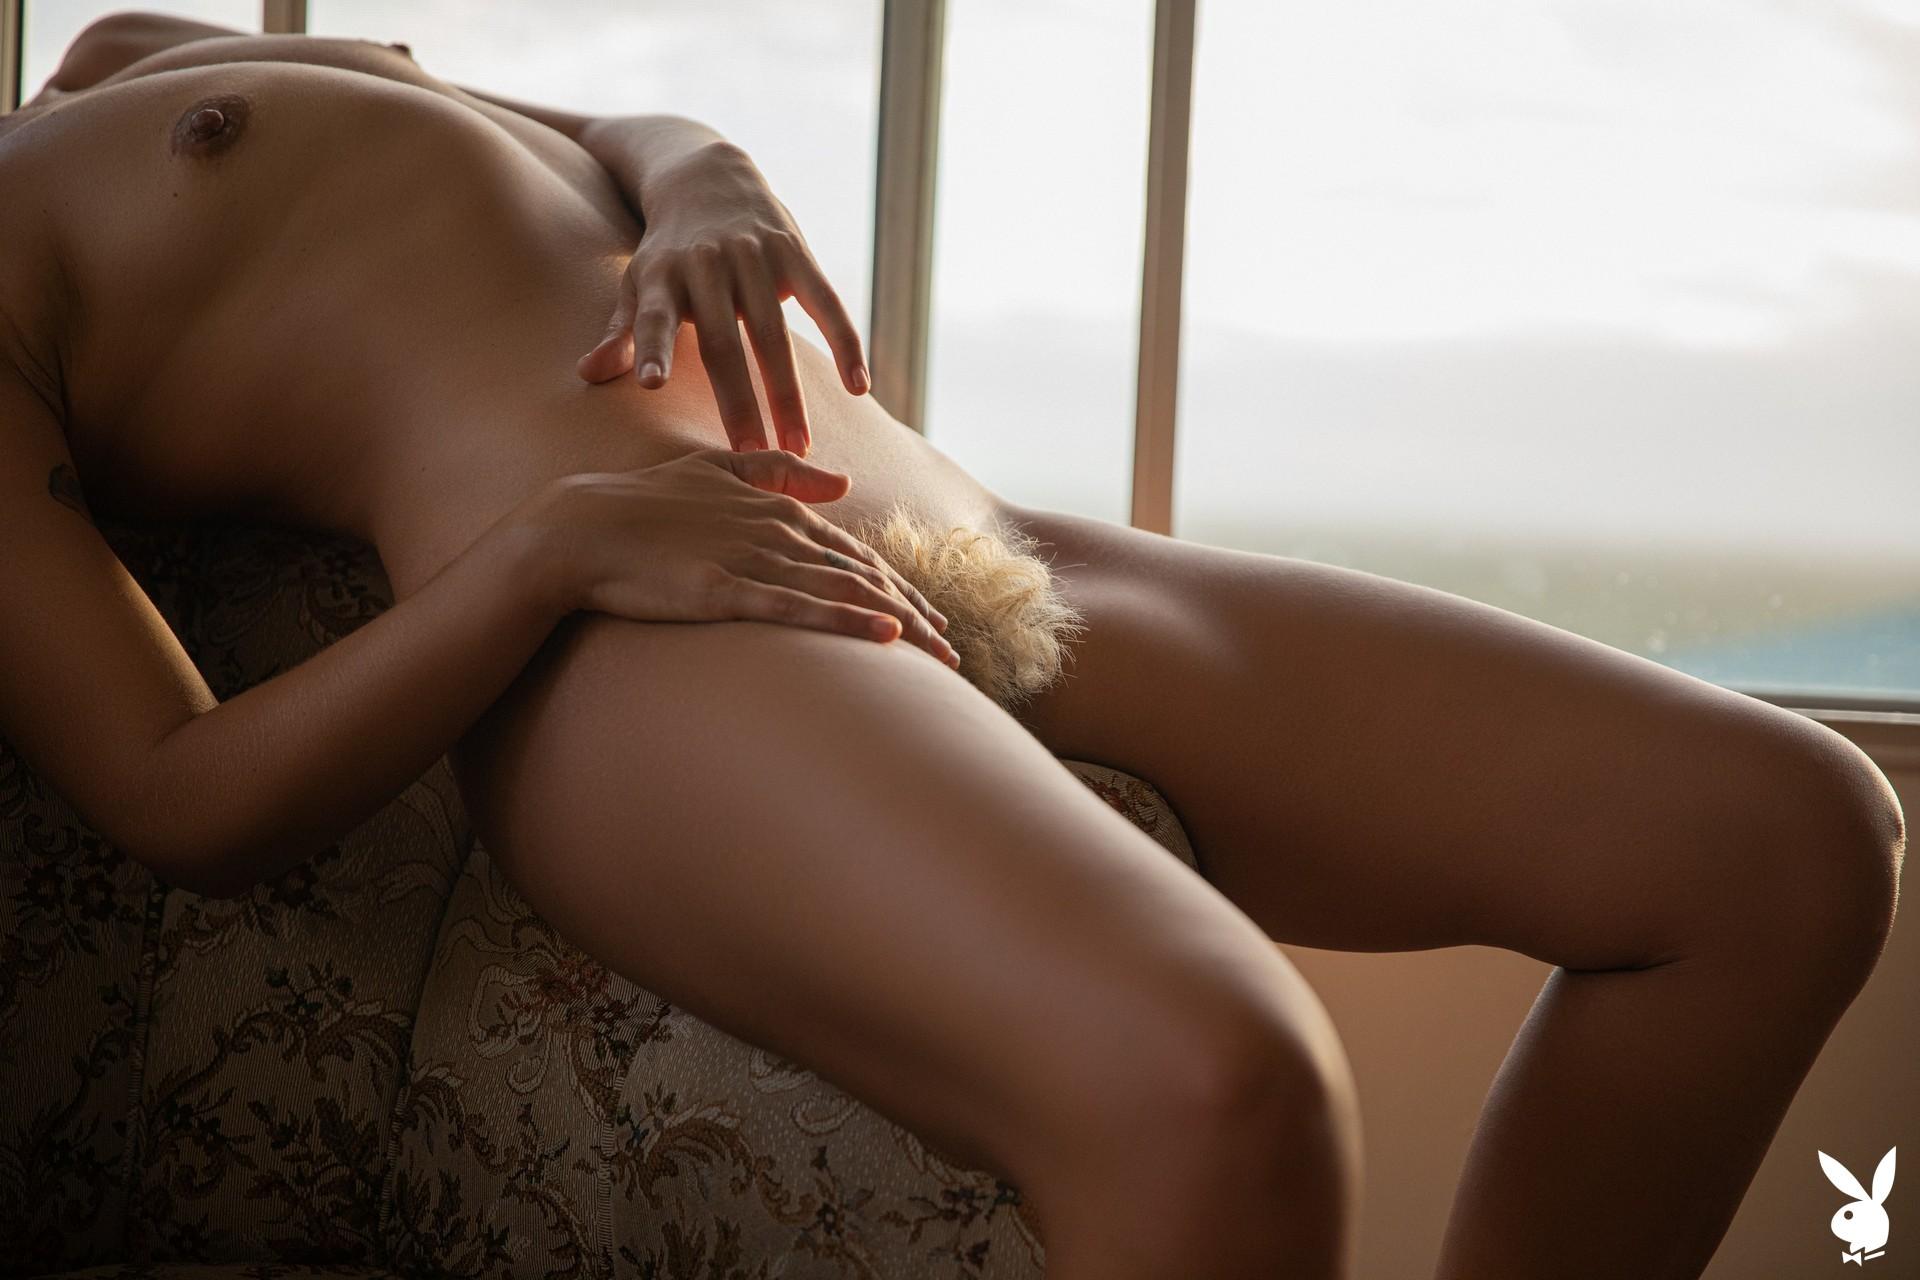 Anna Feller In Lounging Around Playboy Plus (15)